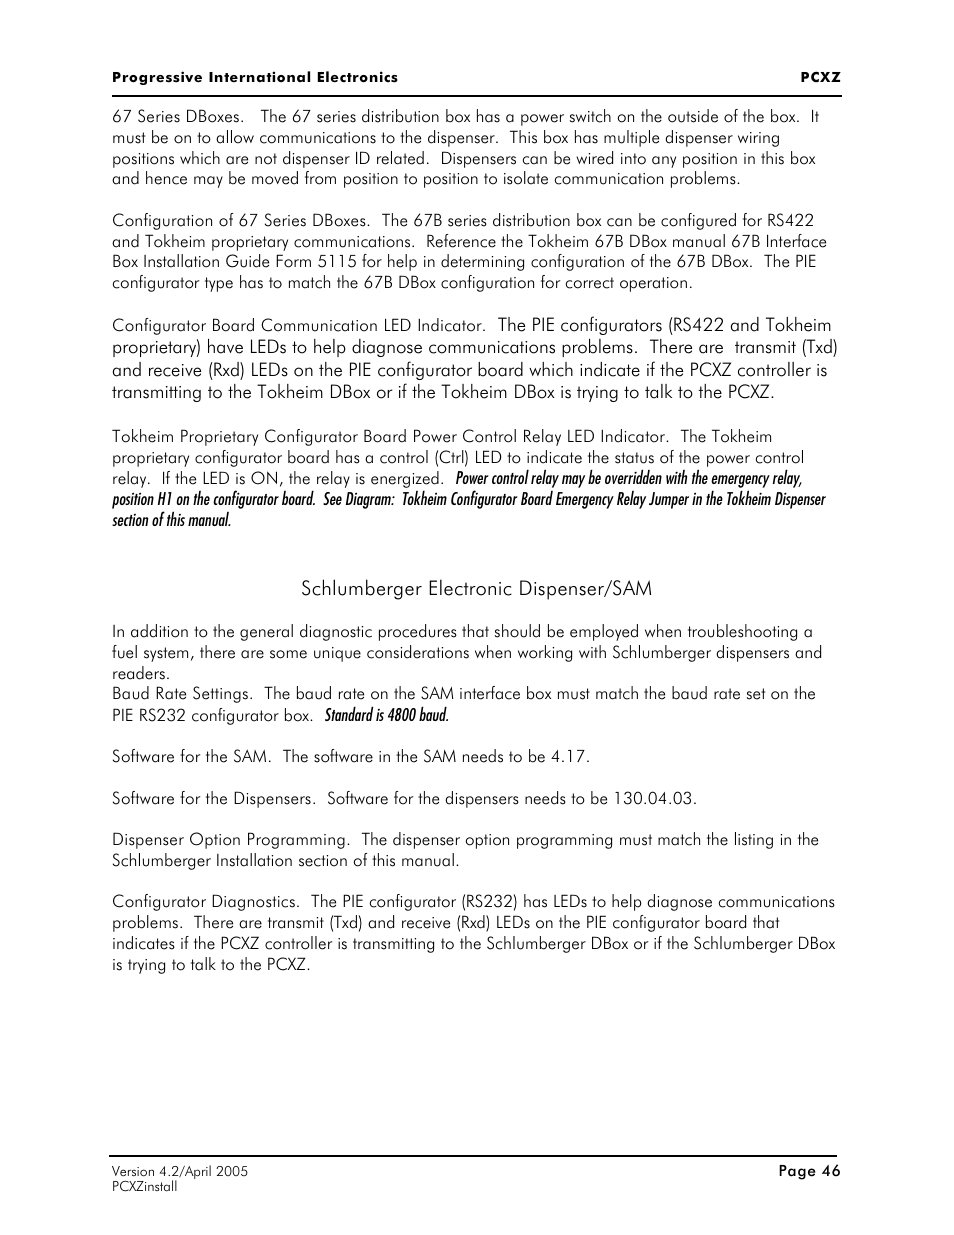 Tokheim 67 Box Manual Ignition Switch Wiring Diagram Additionally John Deere 110 Tlb Backhoe Array Schlumberger Electronic Dispenser Sam Progressive International Rh Manualsdir Com